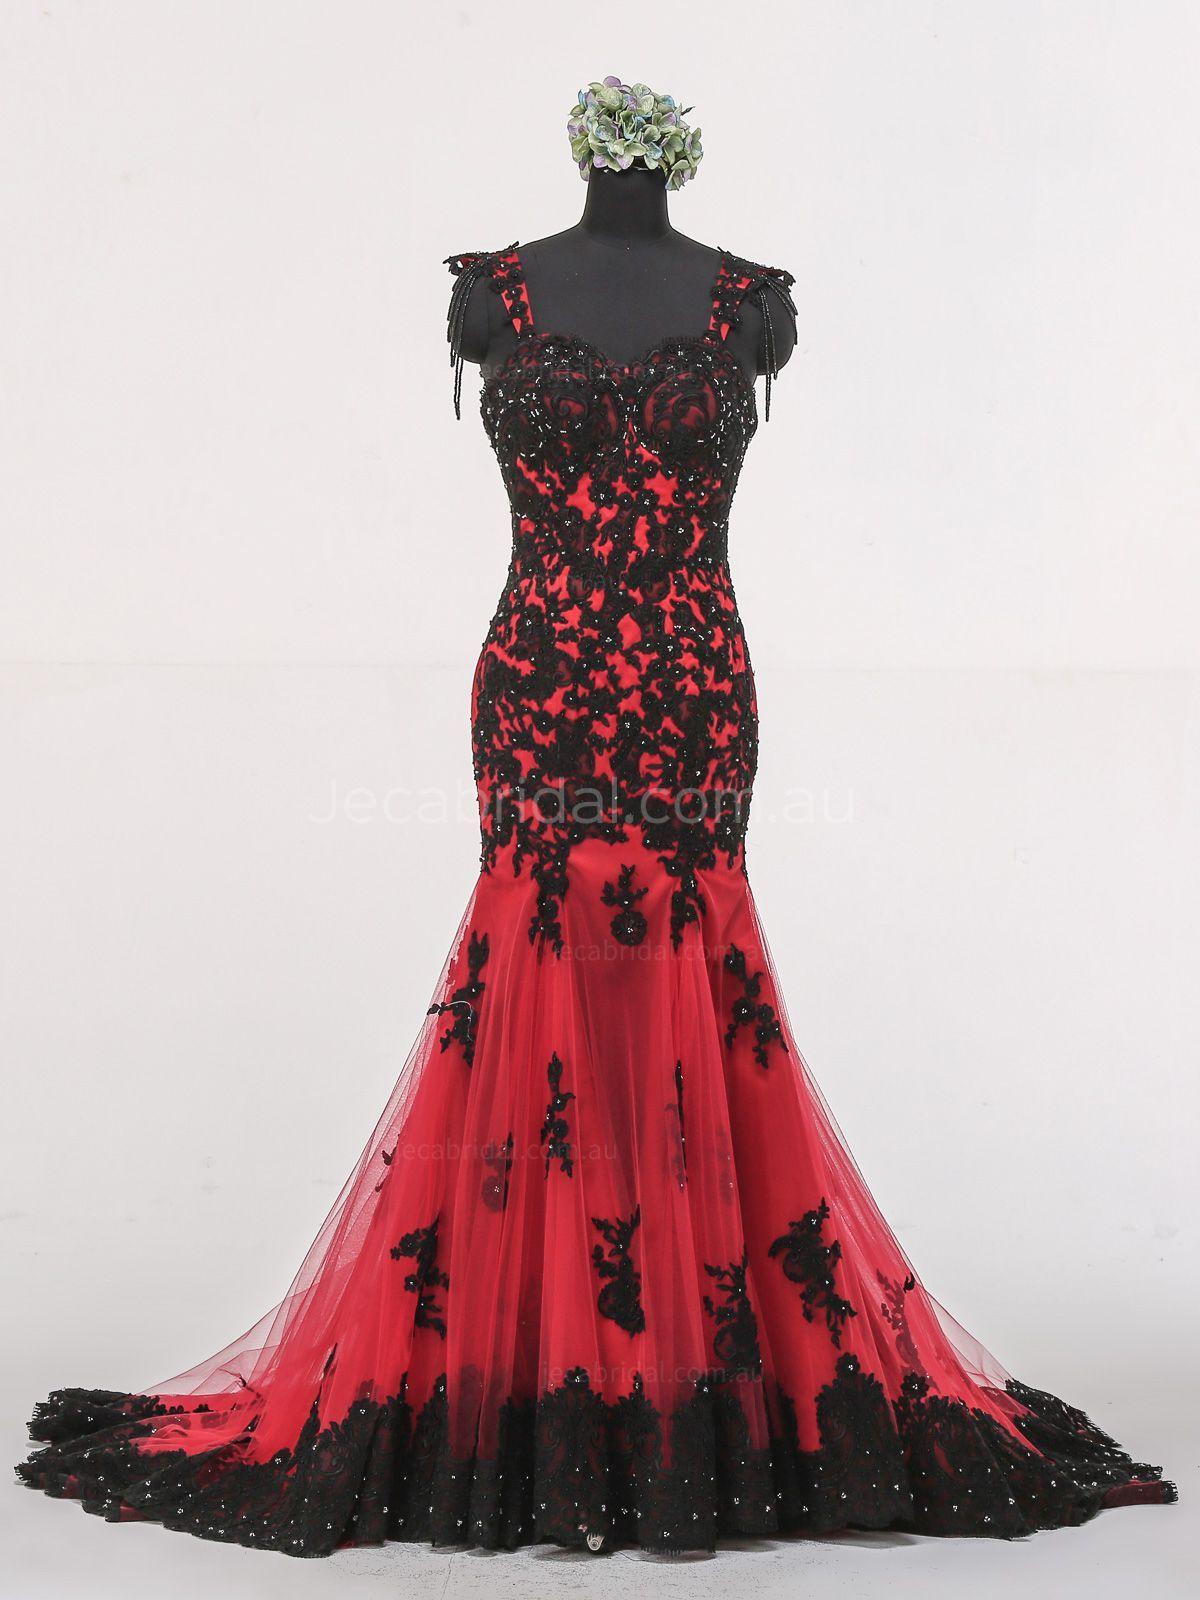 Red and black wedding dress  Mermaid Cap Sleeves Gothic Wedding Dress W  UhOh  Pinterest